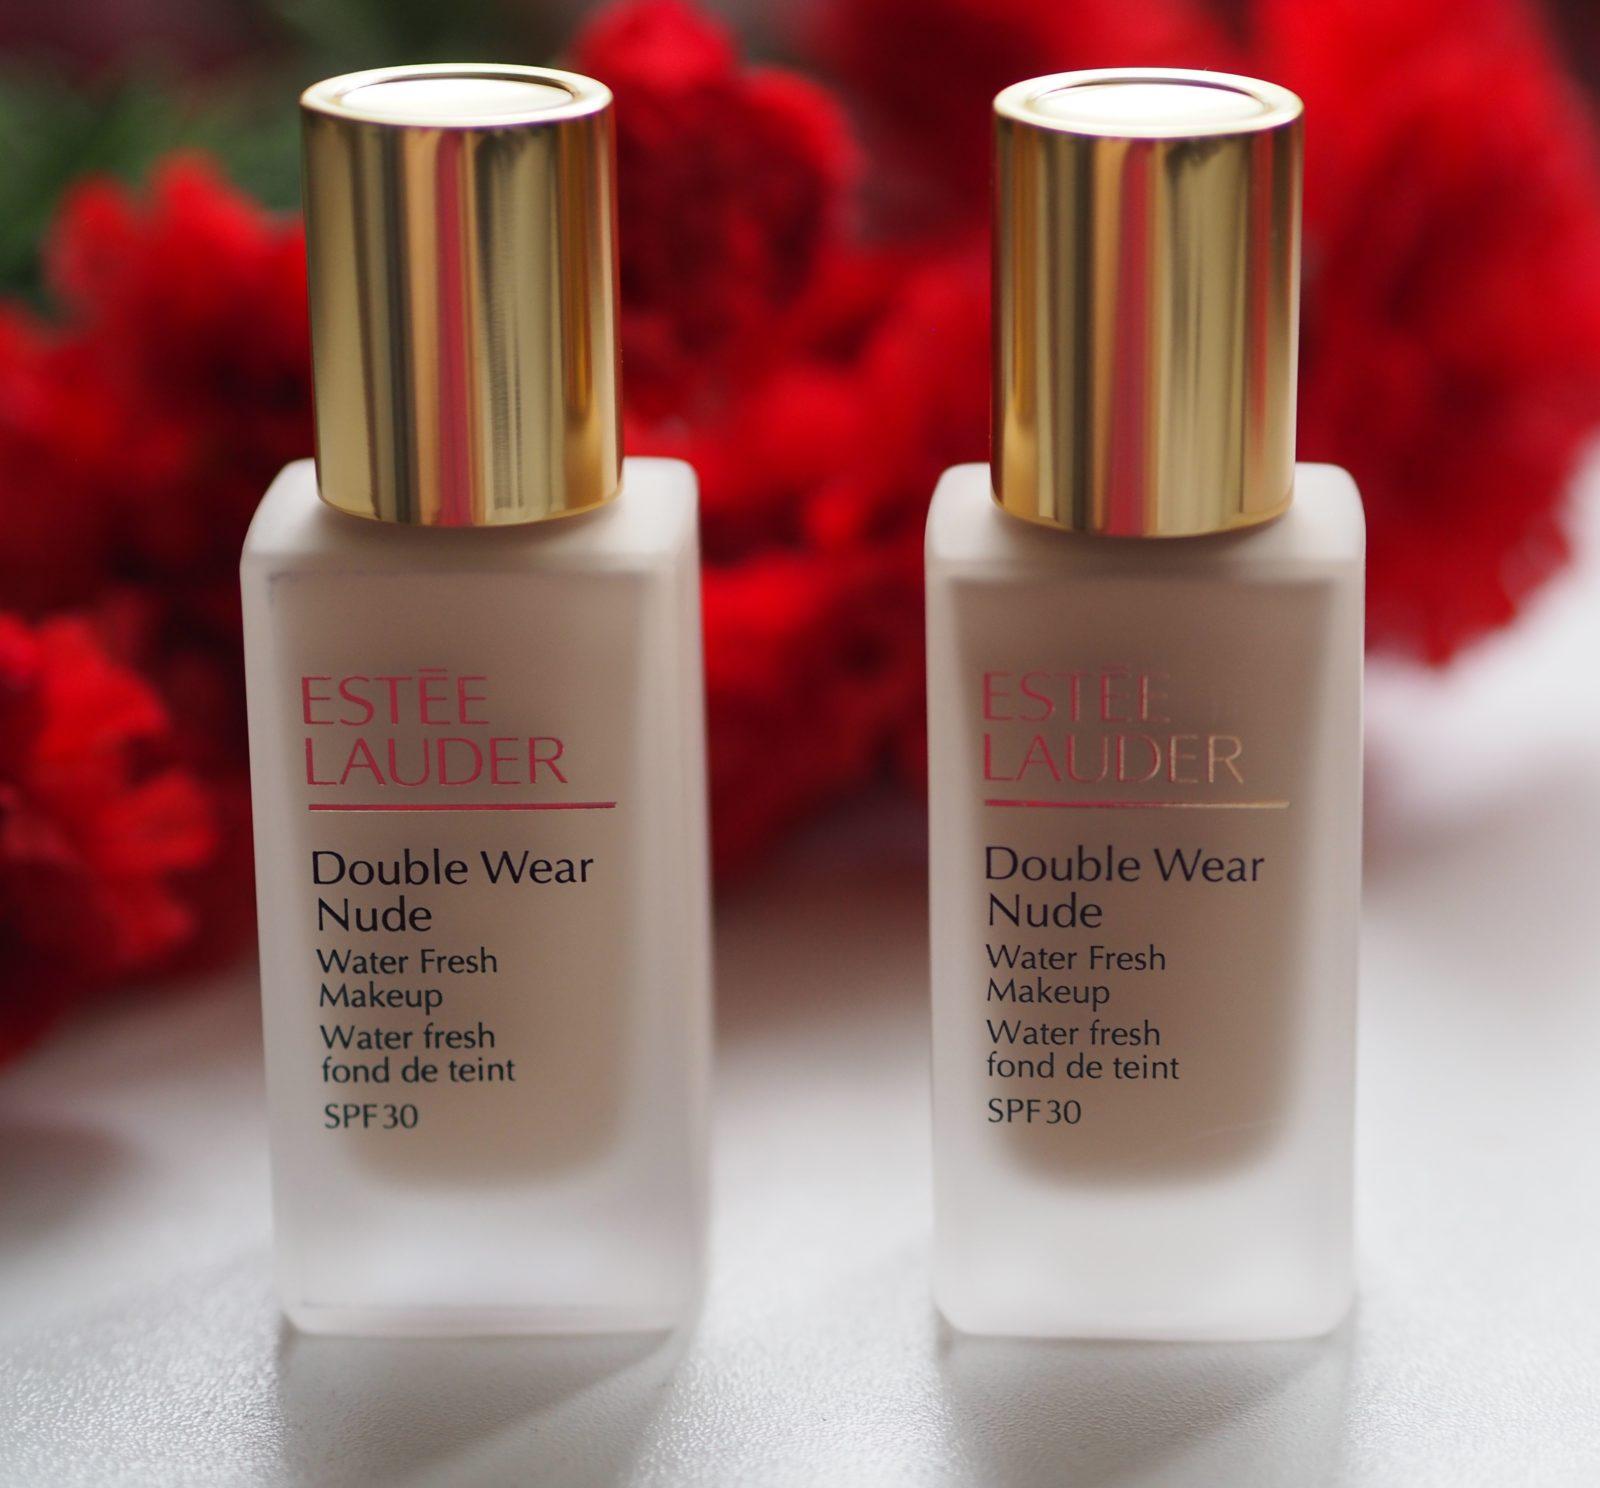 Estee Lauder Double Wear Nude Water Fresh Makeup Review